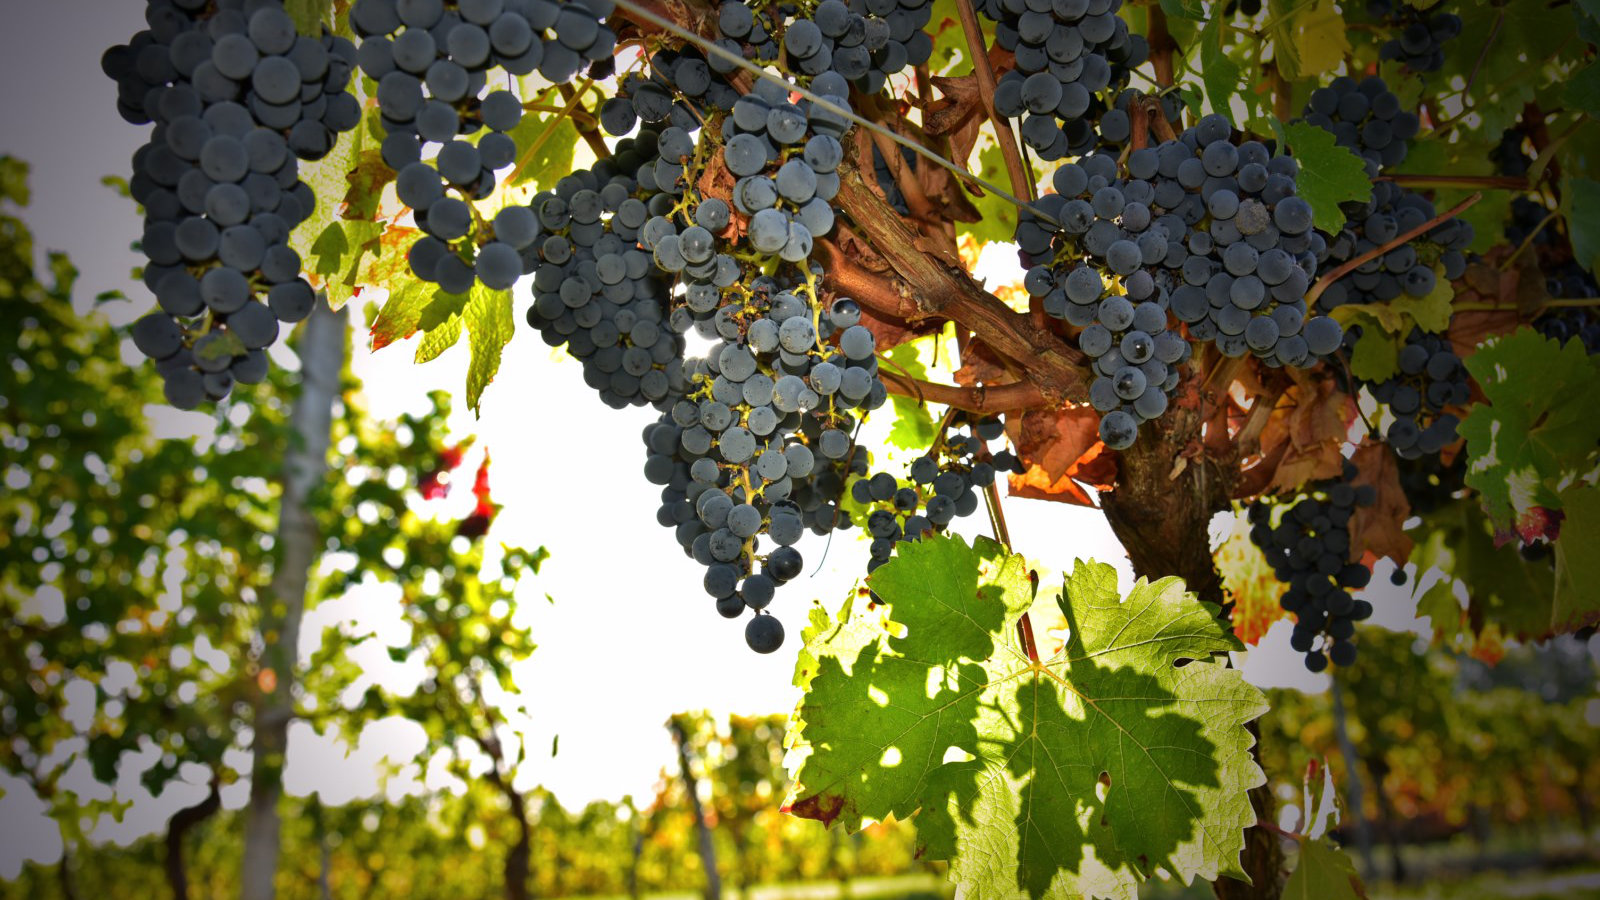 Domaine viticole à Faleyras